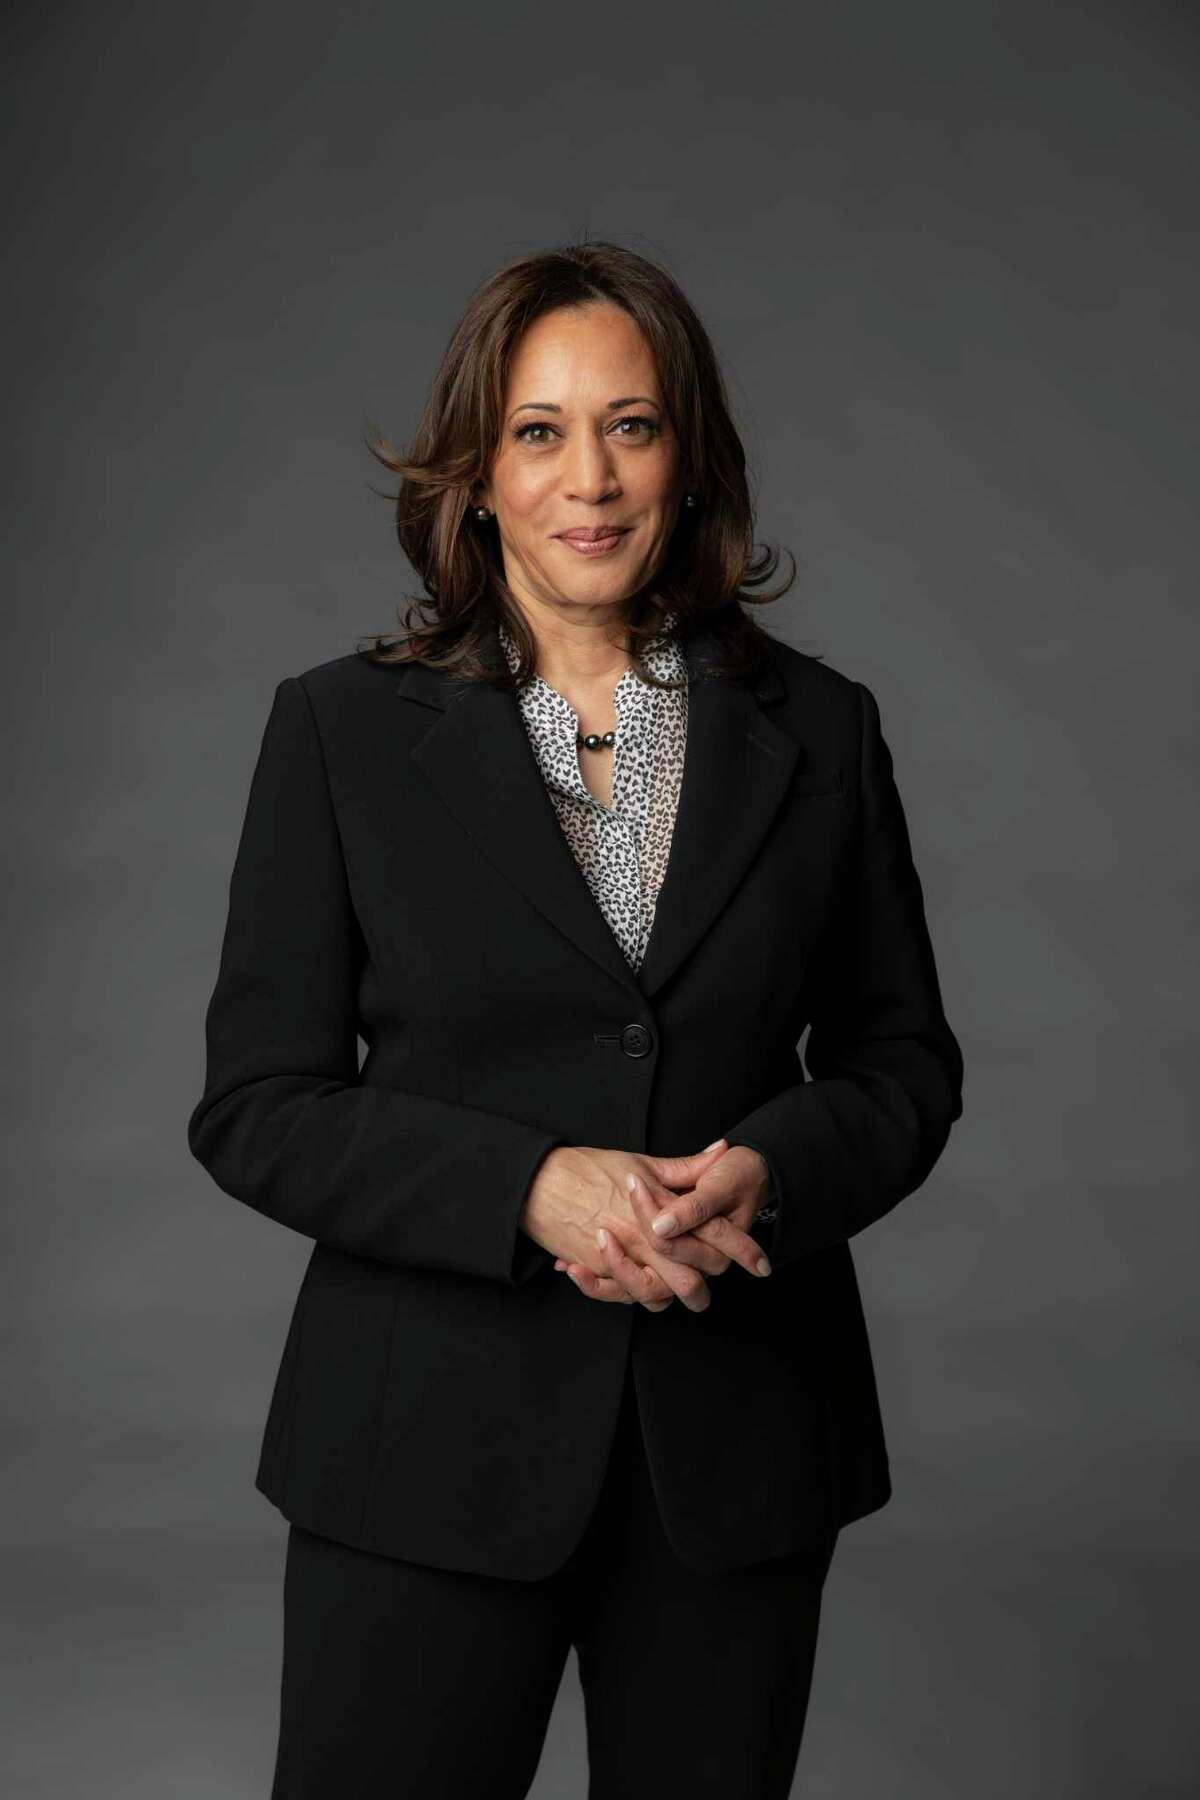 FILE -- Sen. Kamala Harris (D-Calif.) in New York, April 5, 2019. Former Vice President Joe Biden announced Harris as his running mate on Aug. 11, 2020. (Tony Cenicola/The New York Times)